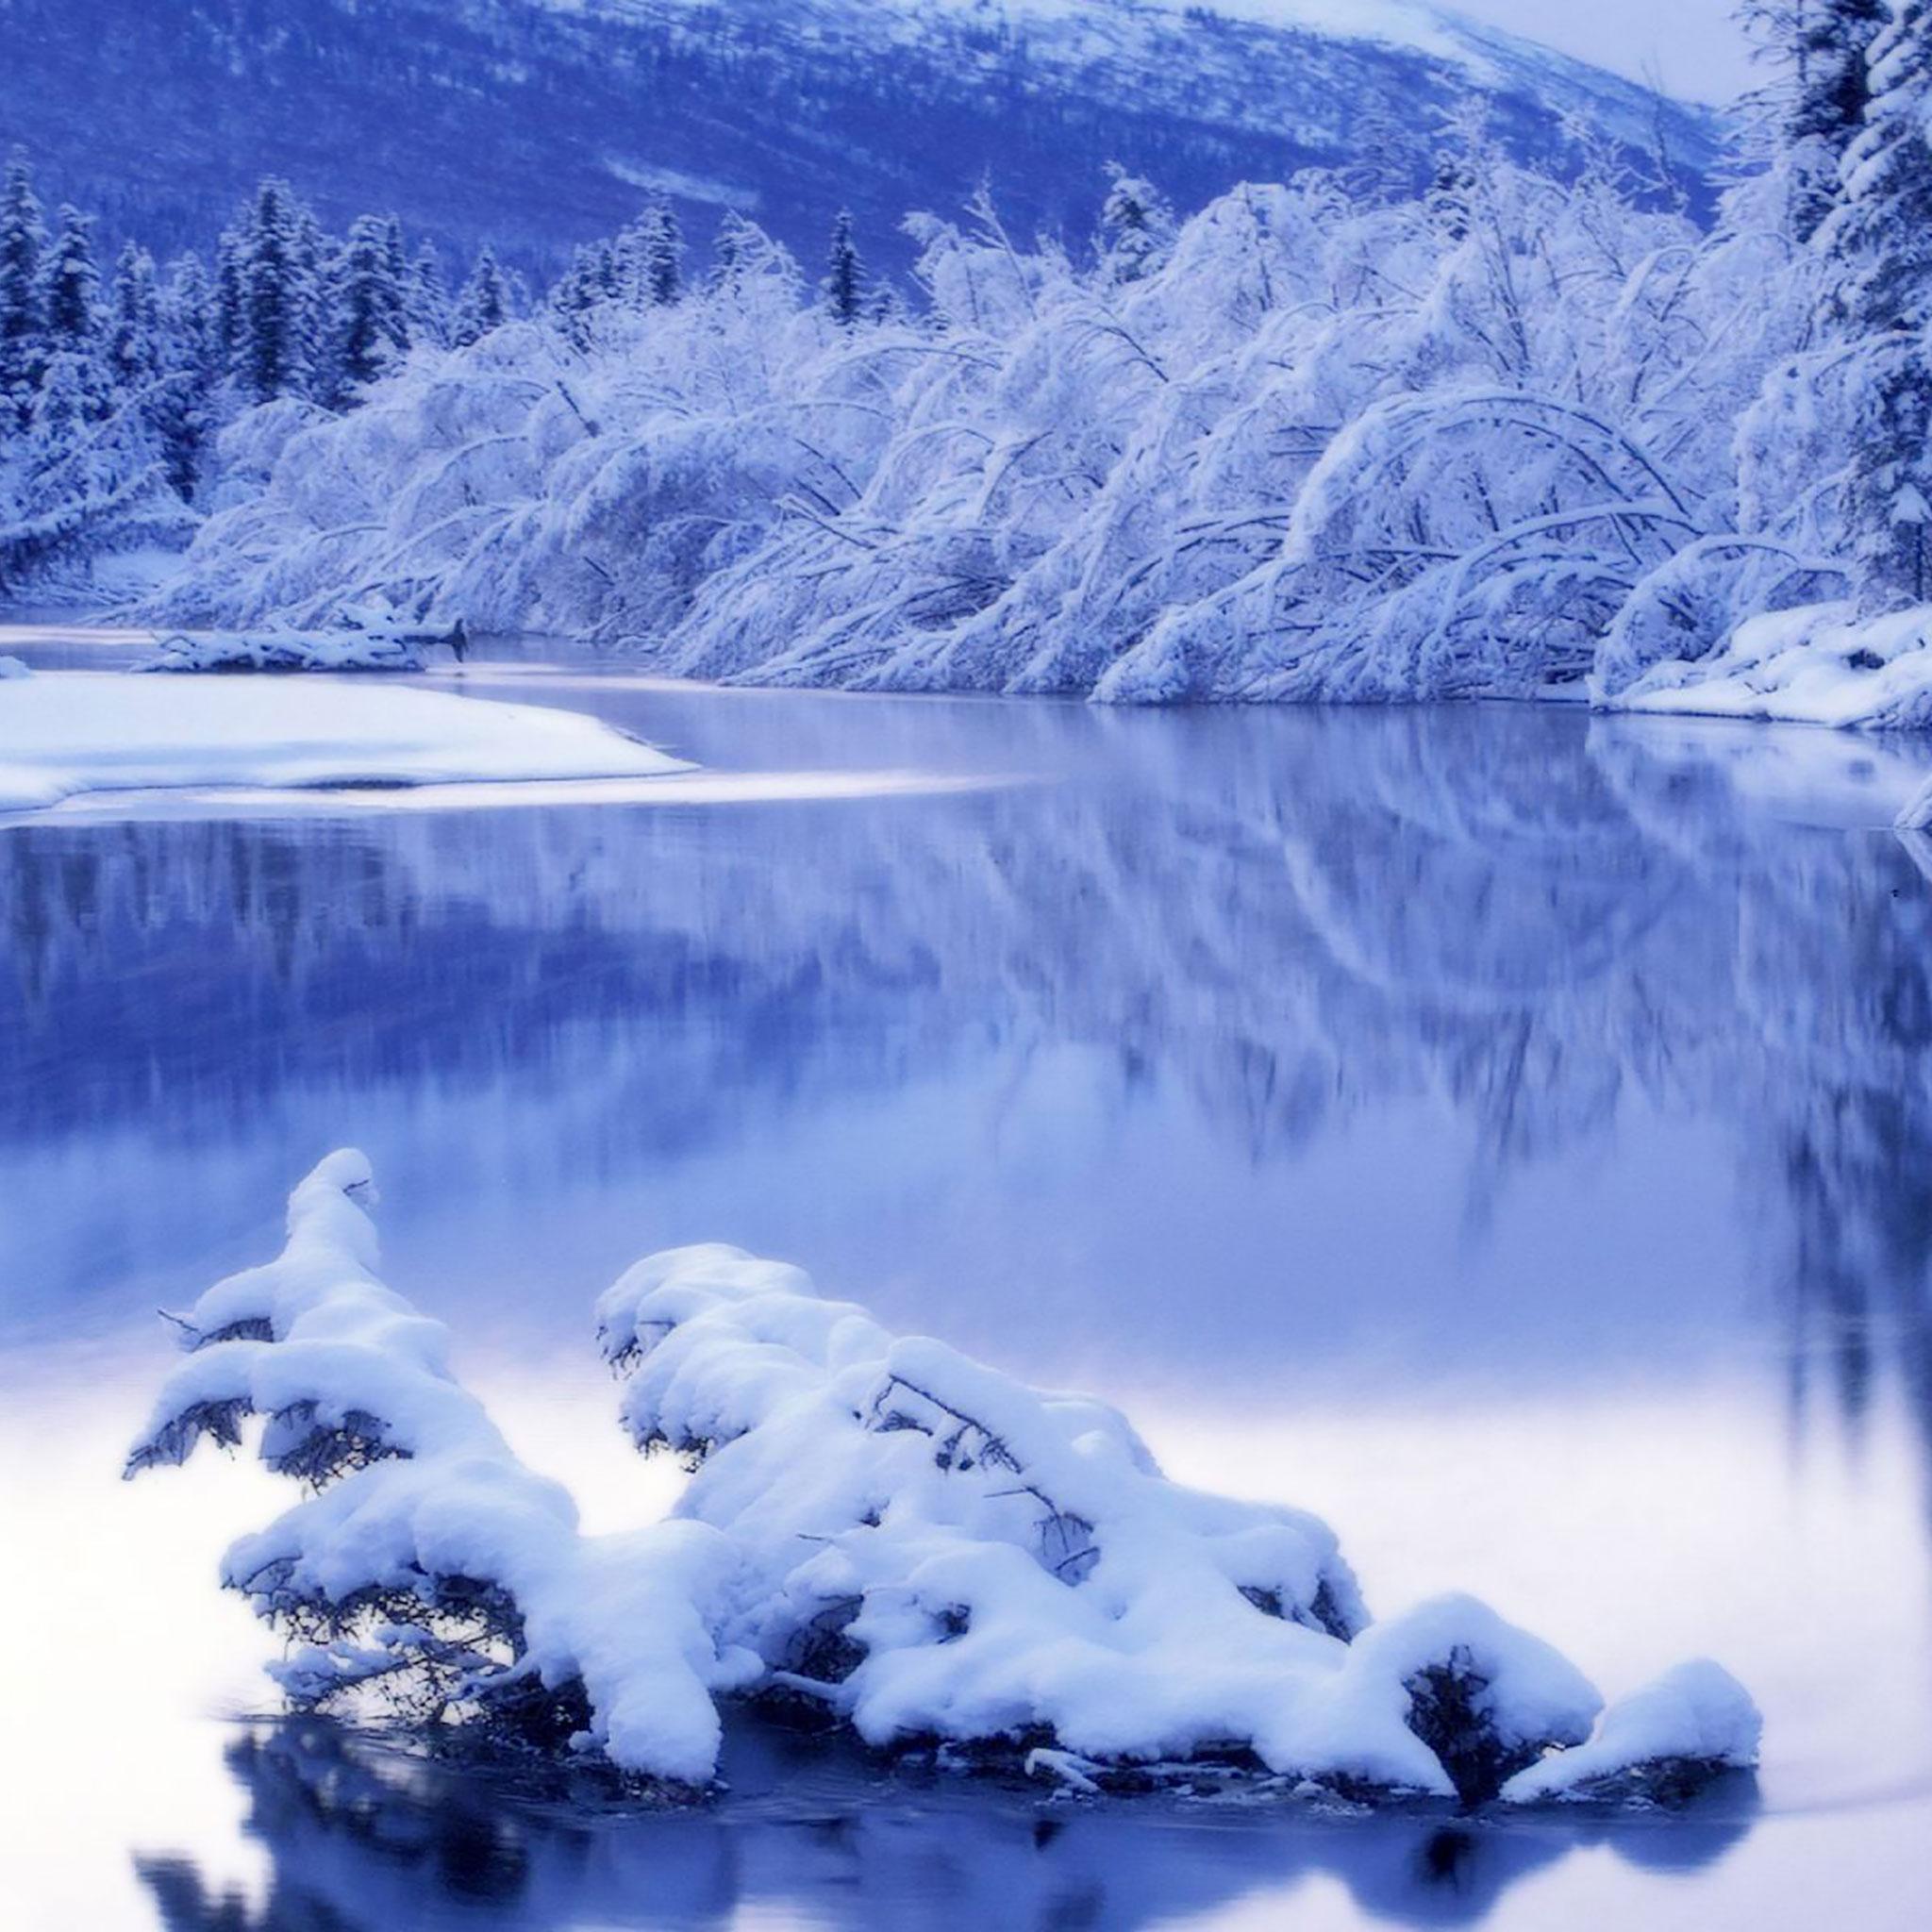 соприкоснемся картинки зима самсунг приятным бонусом будет